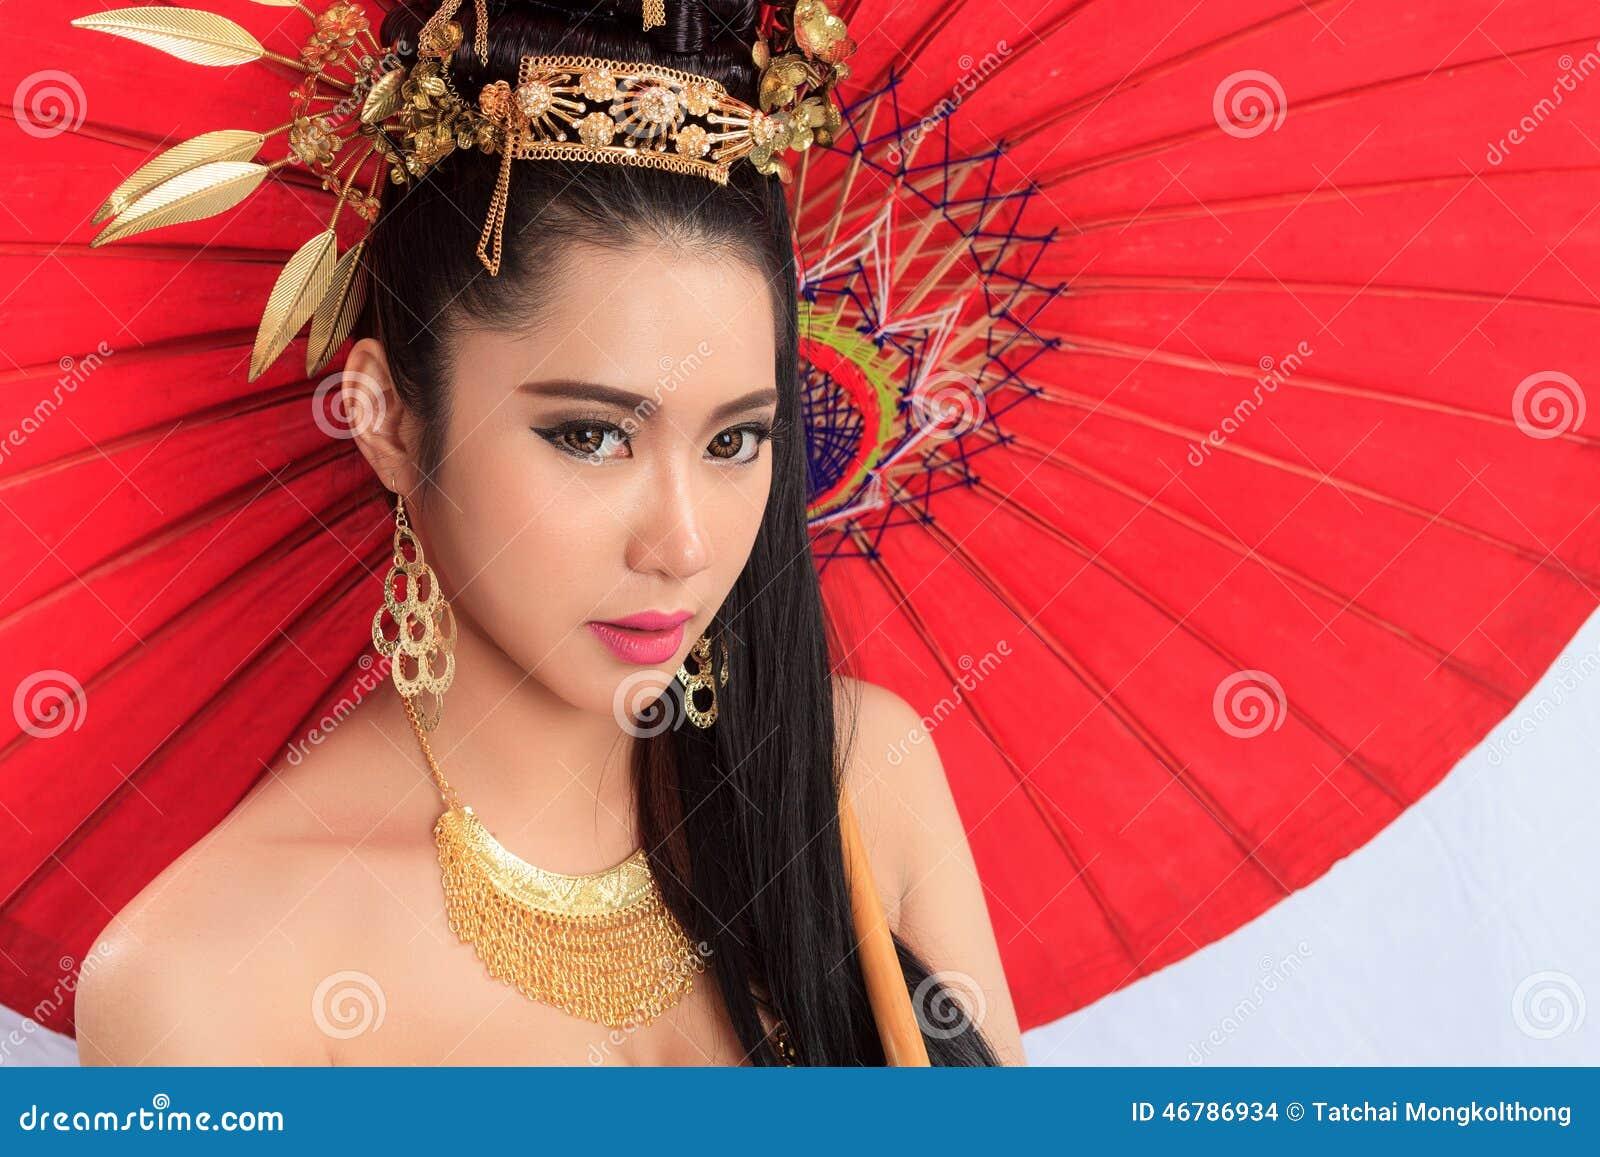 Forum rencontre thailandaise